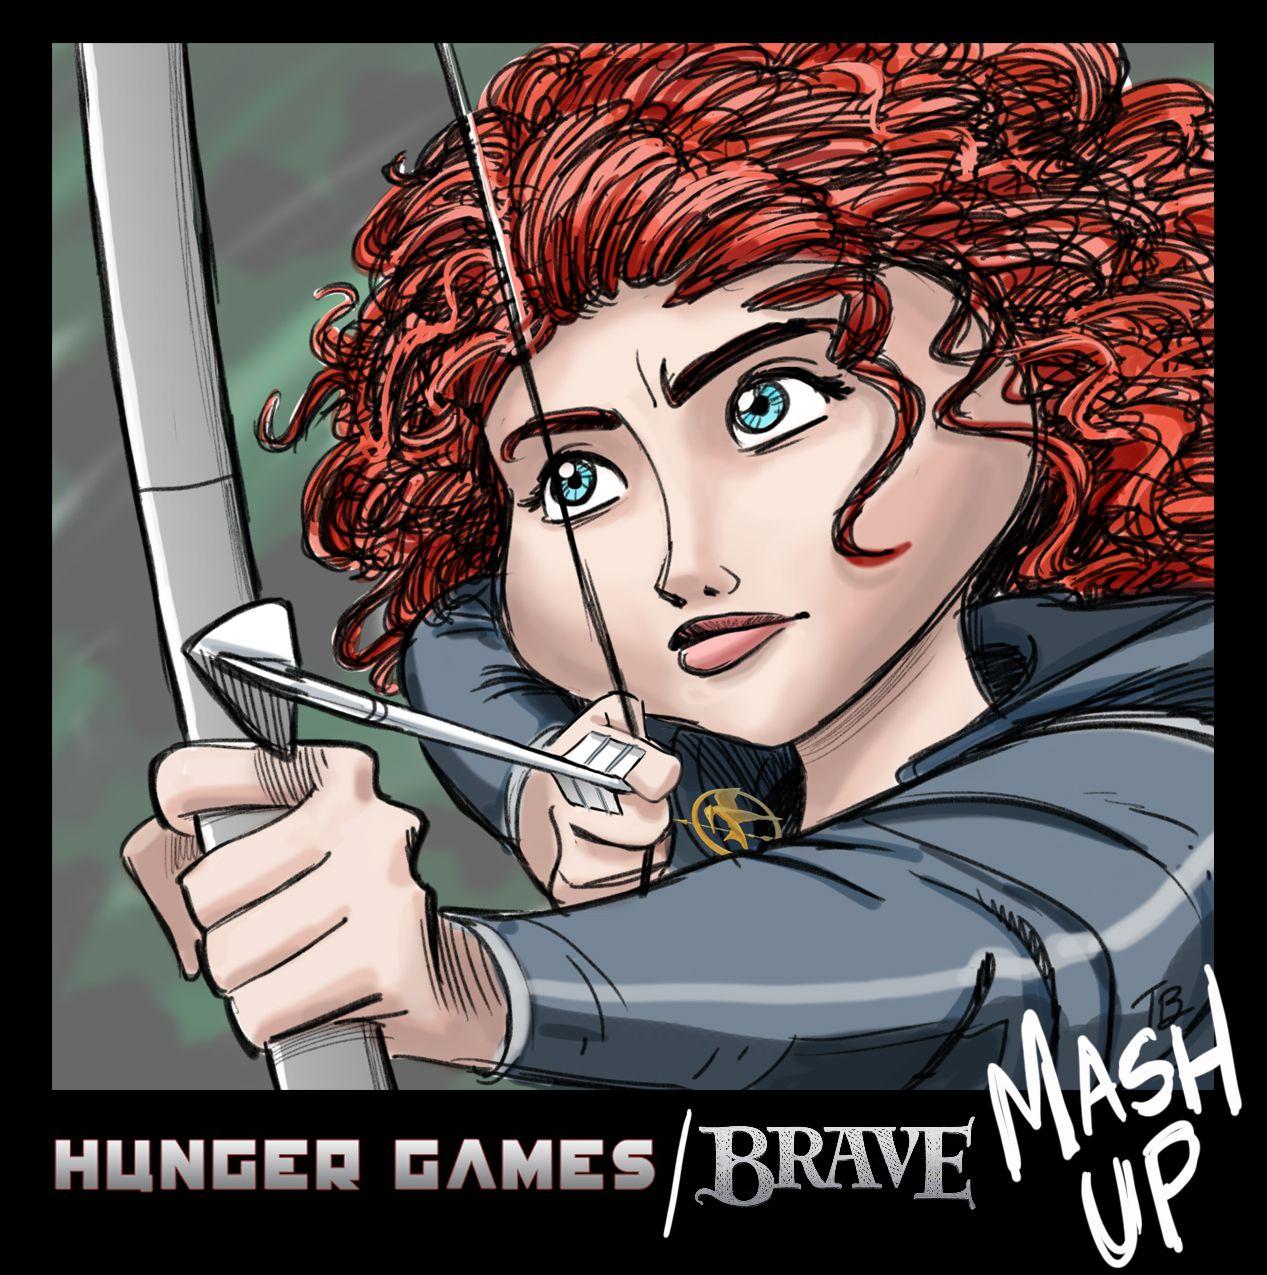 Disney Pixar Brave meets Hunger Games Katniss vs Princess Merida ...